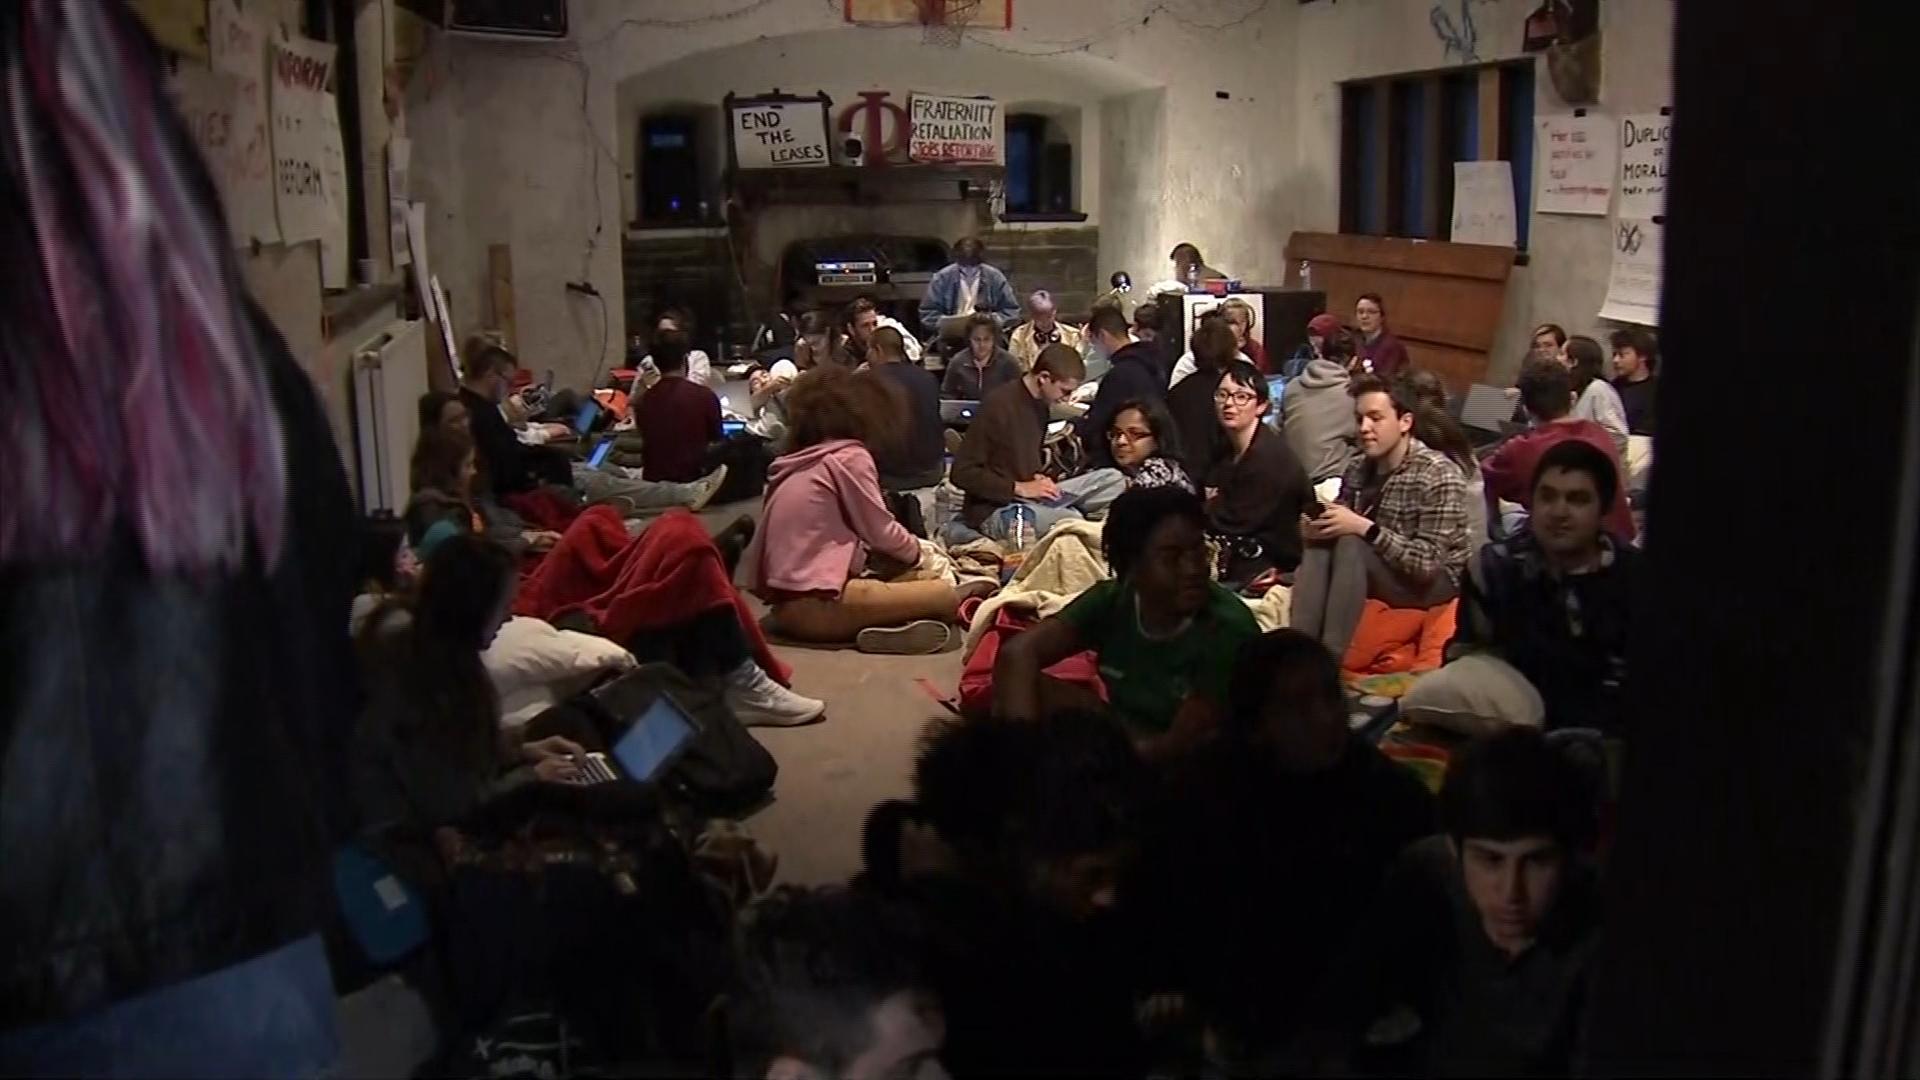 A Pennsylvania college suspends frat activity amid backlash